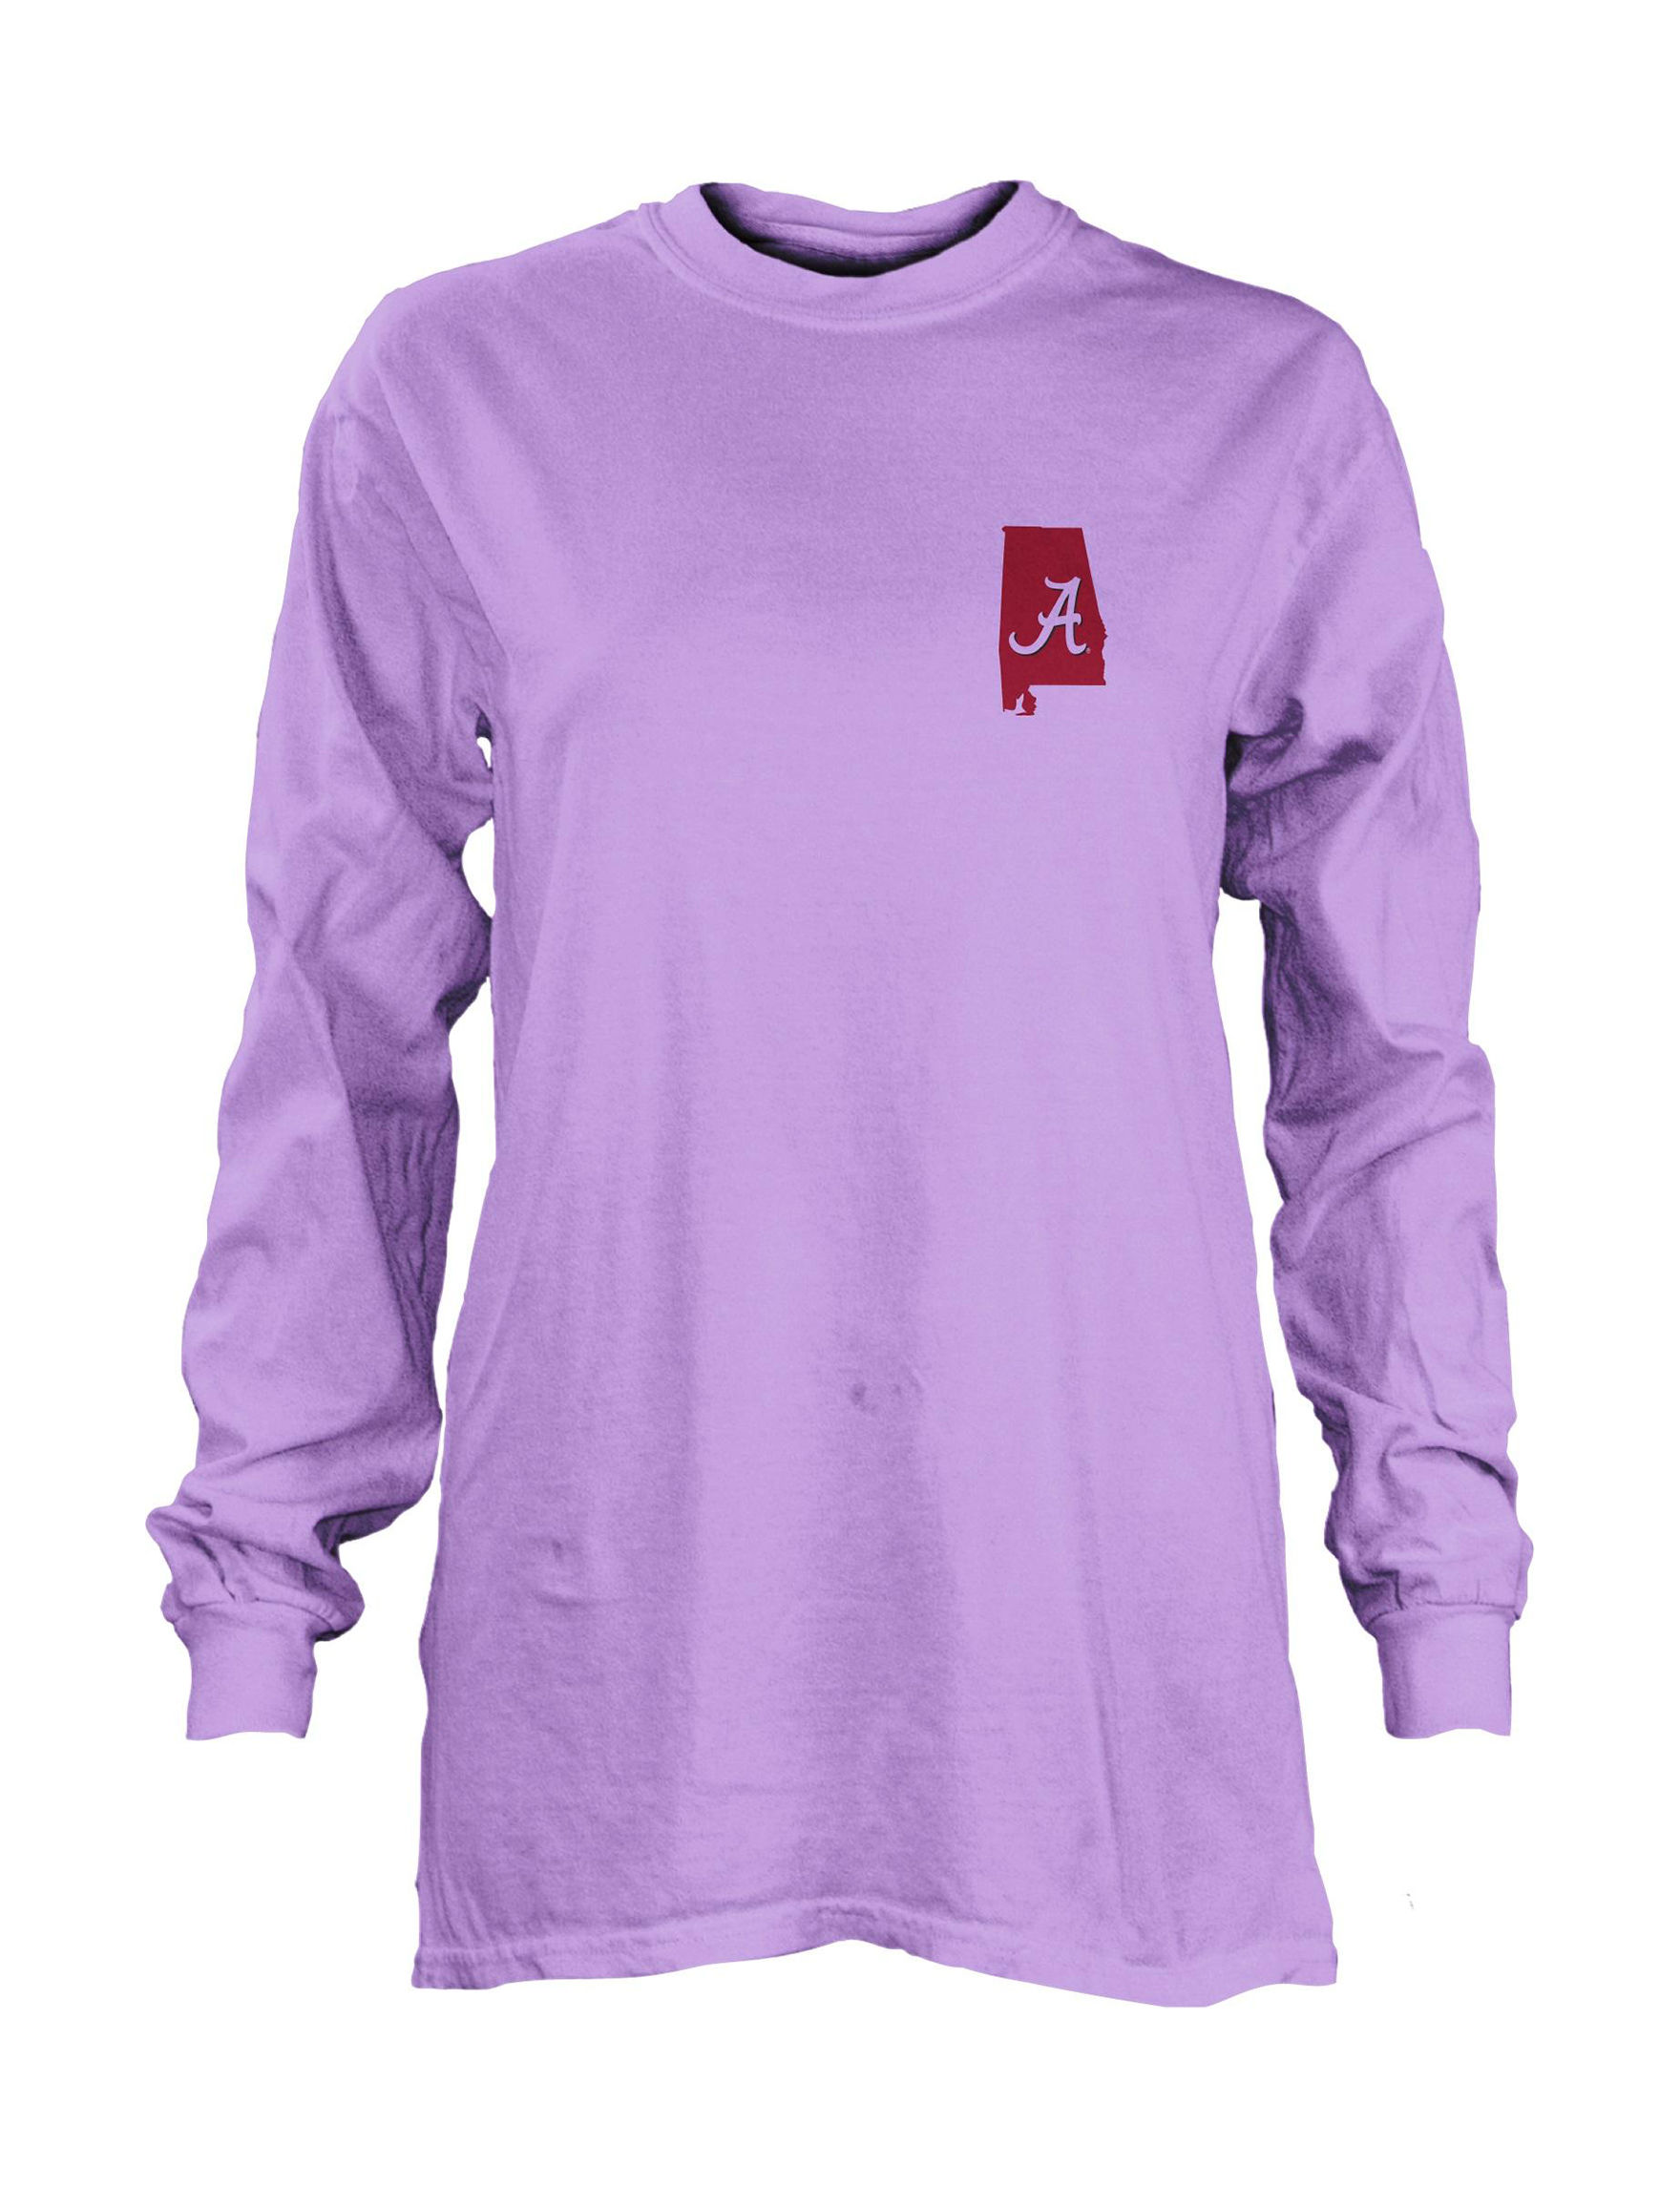 NCAA Lilac Tees & Tanks